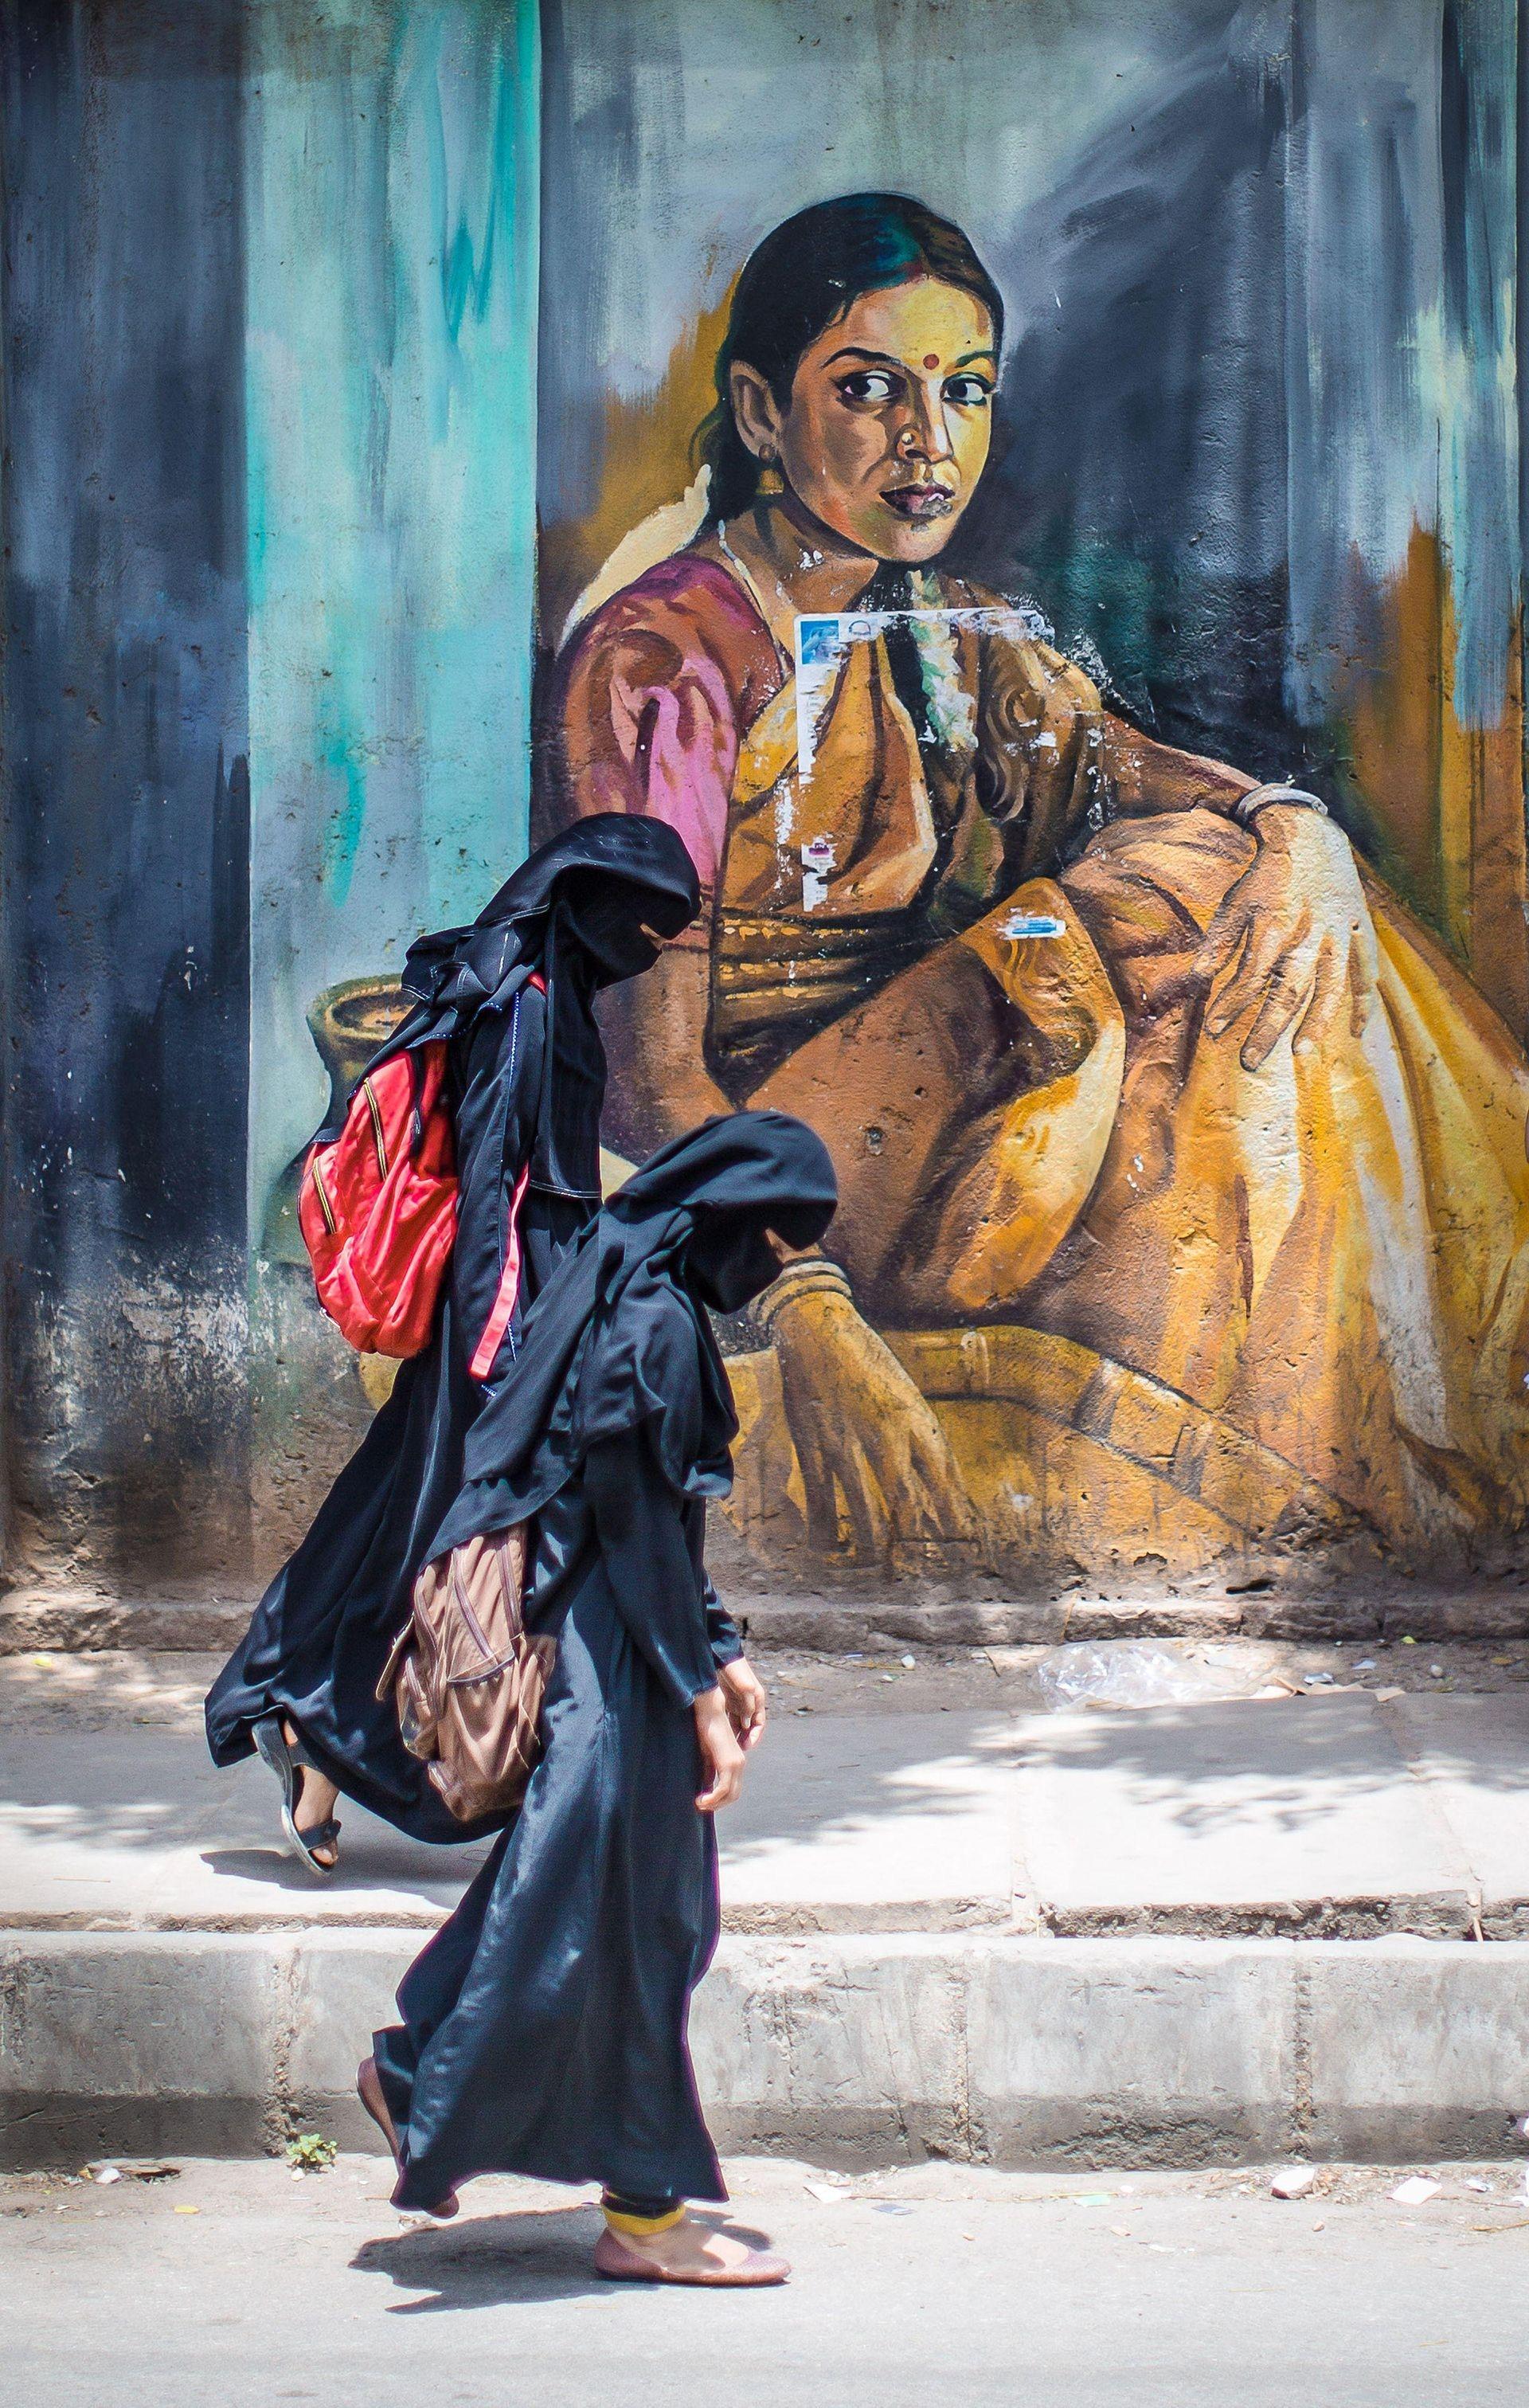 Photograph by Vijay Nanda, National Geographic Your Shot